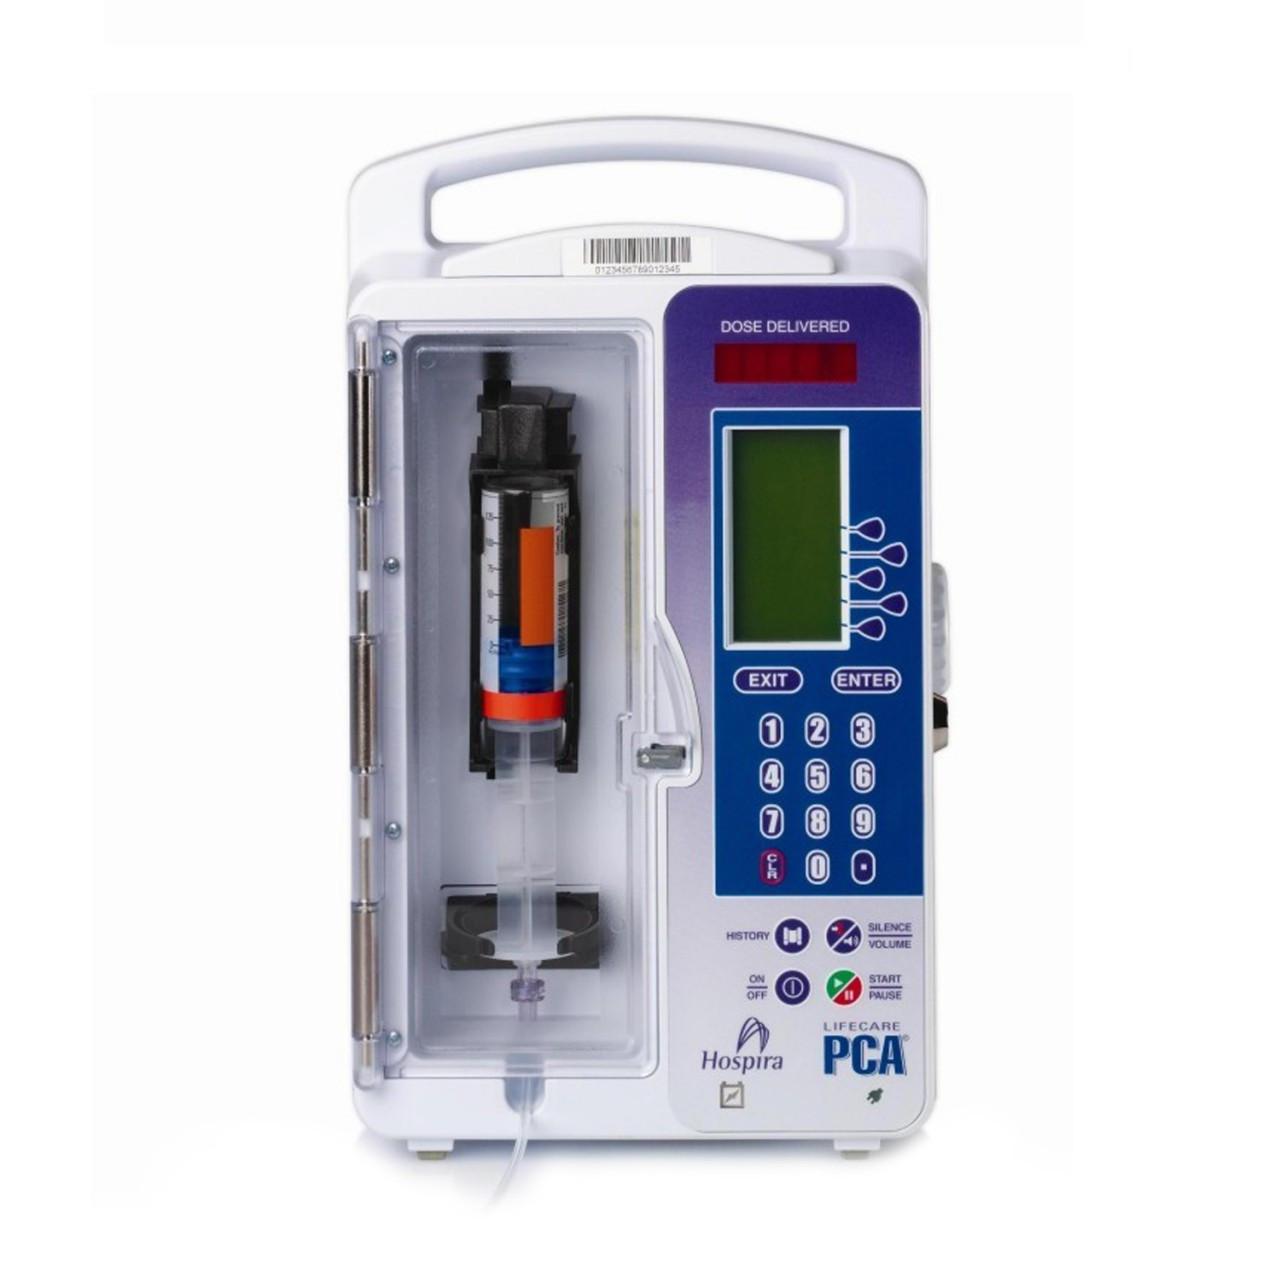 Abbott Lifecare PCA 3 Infusion Pump - Pacific Medical